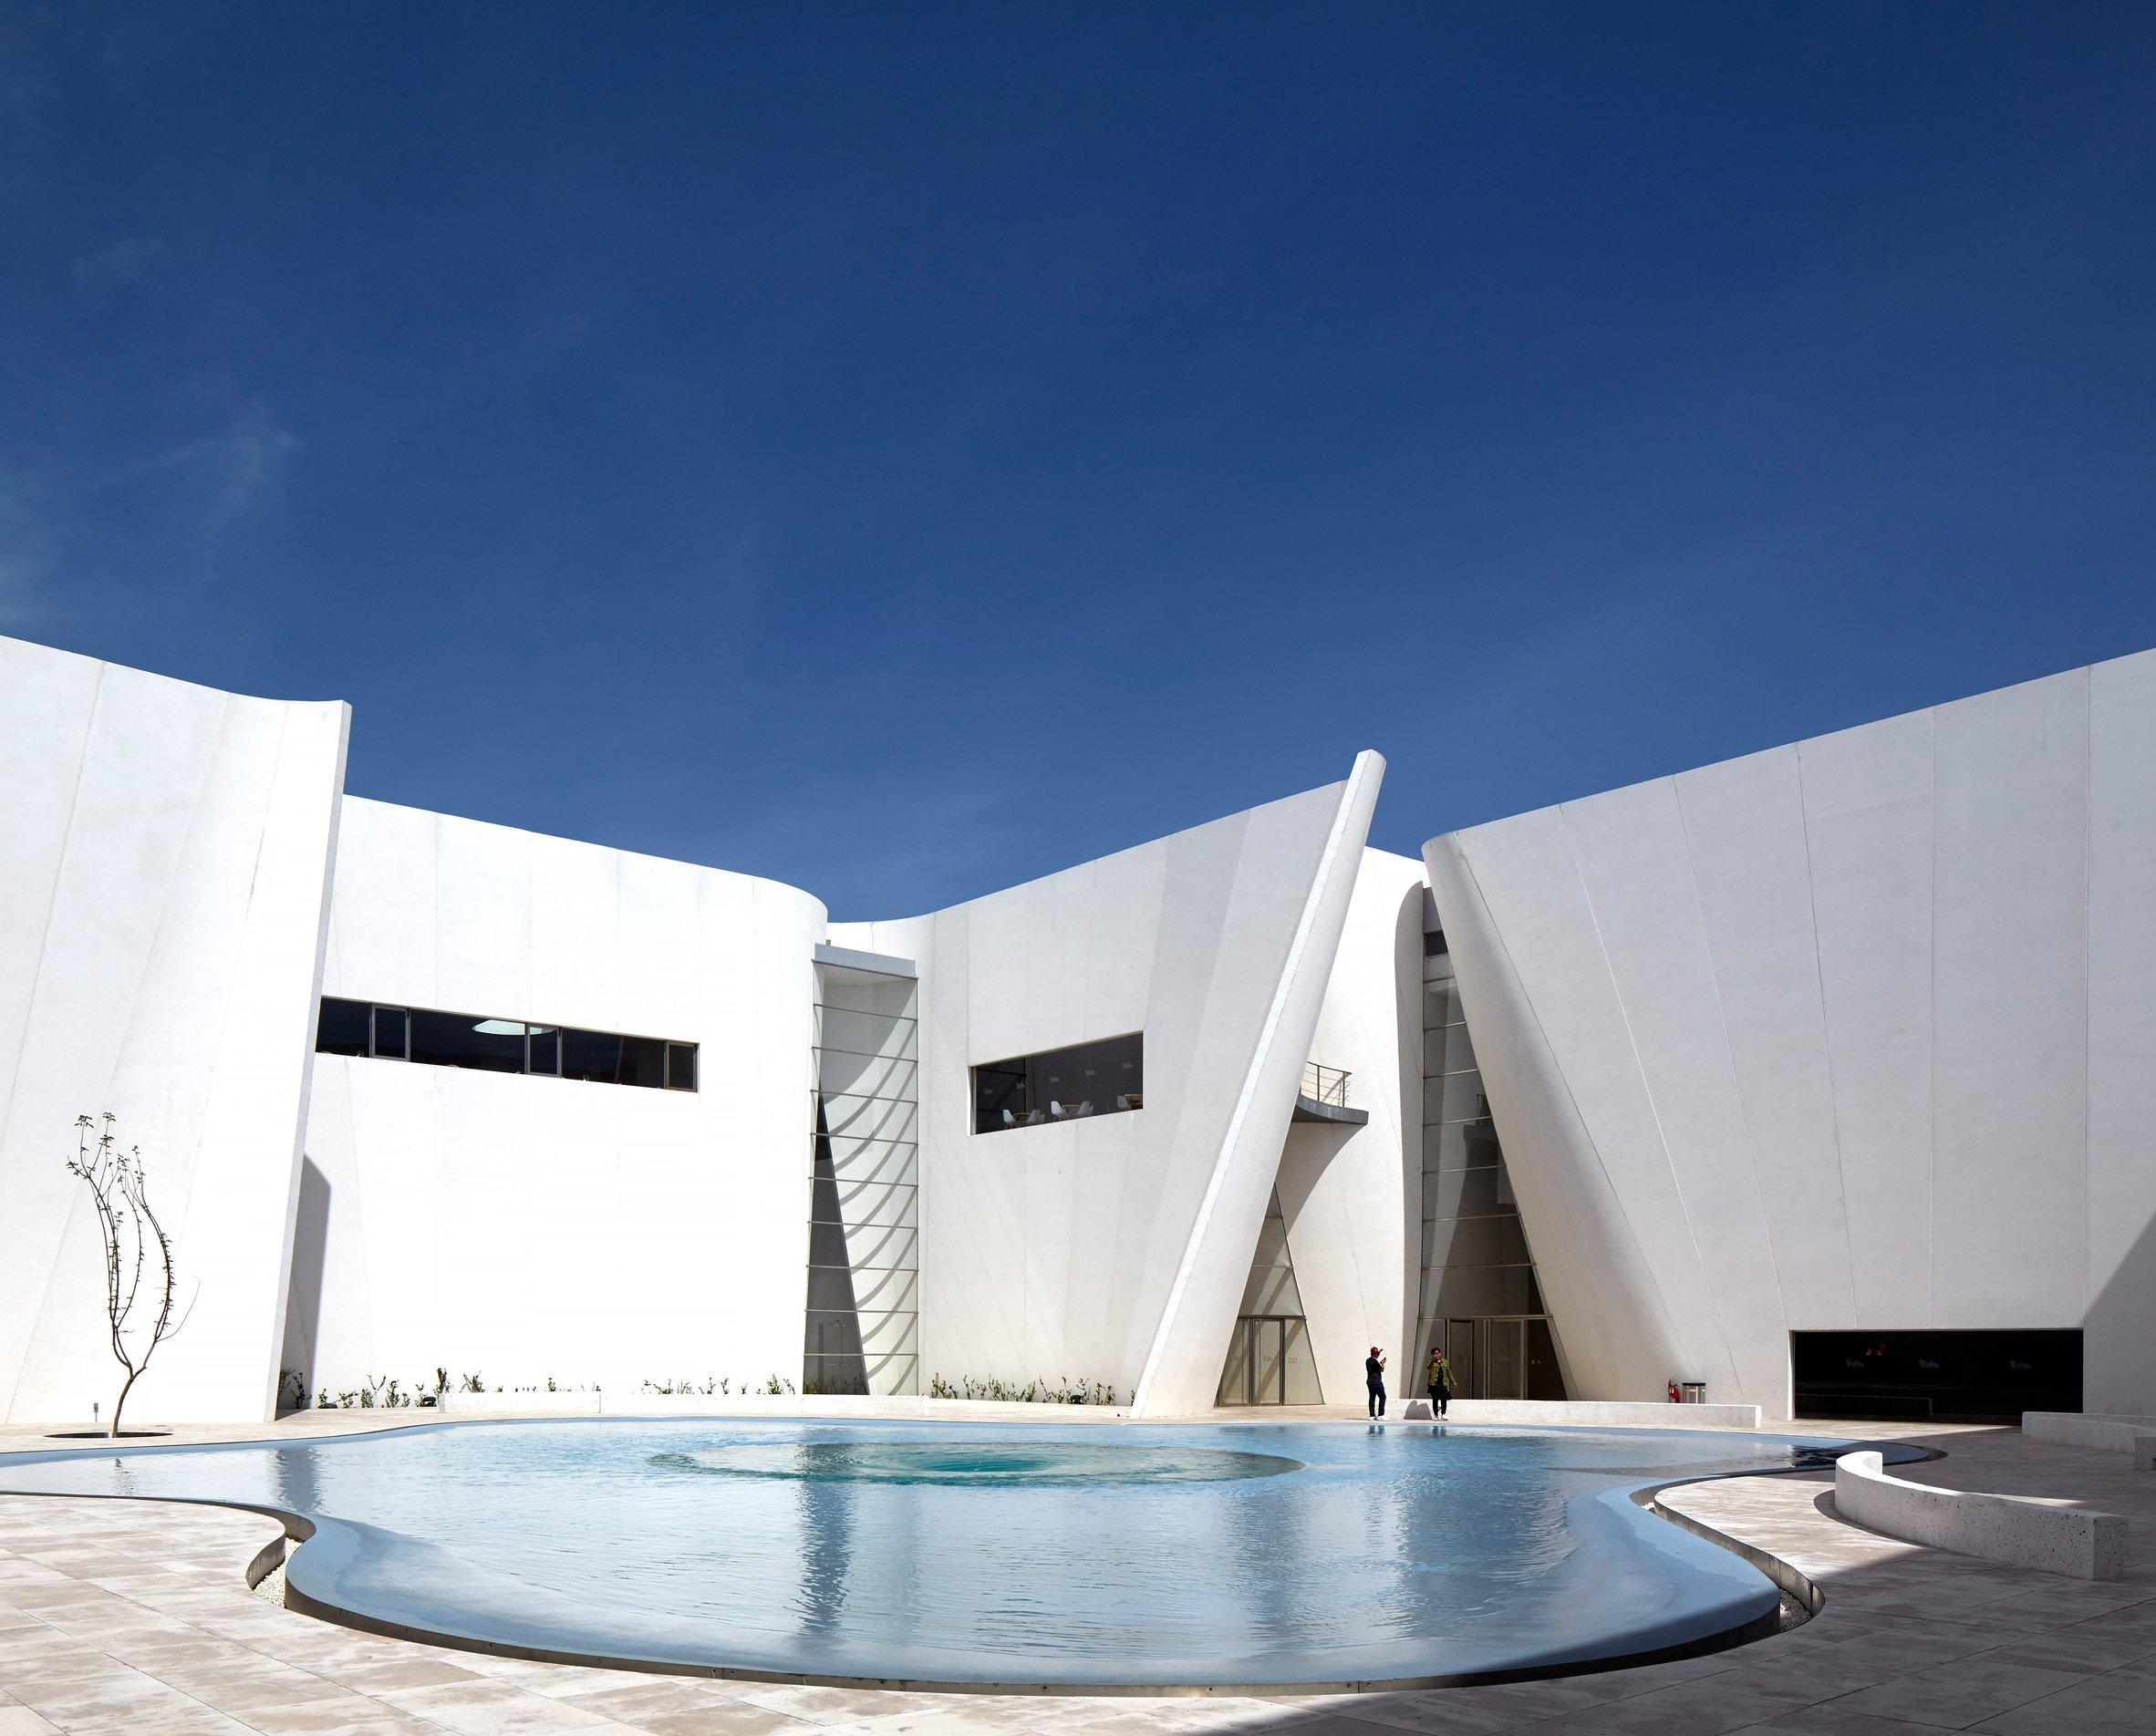 museo-internacional-del-barroco-cultural-architecture-museum-toyo-ito-peubla-mexico-architectural-photography-edmund-sumner_dezeen_2364_col_1